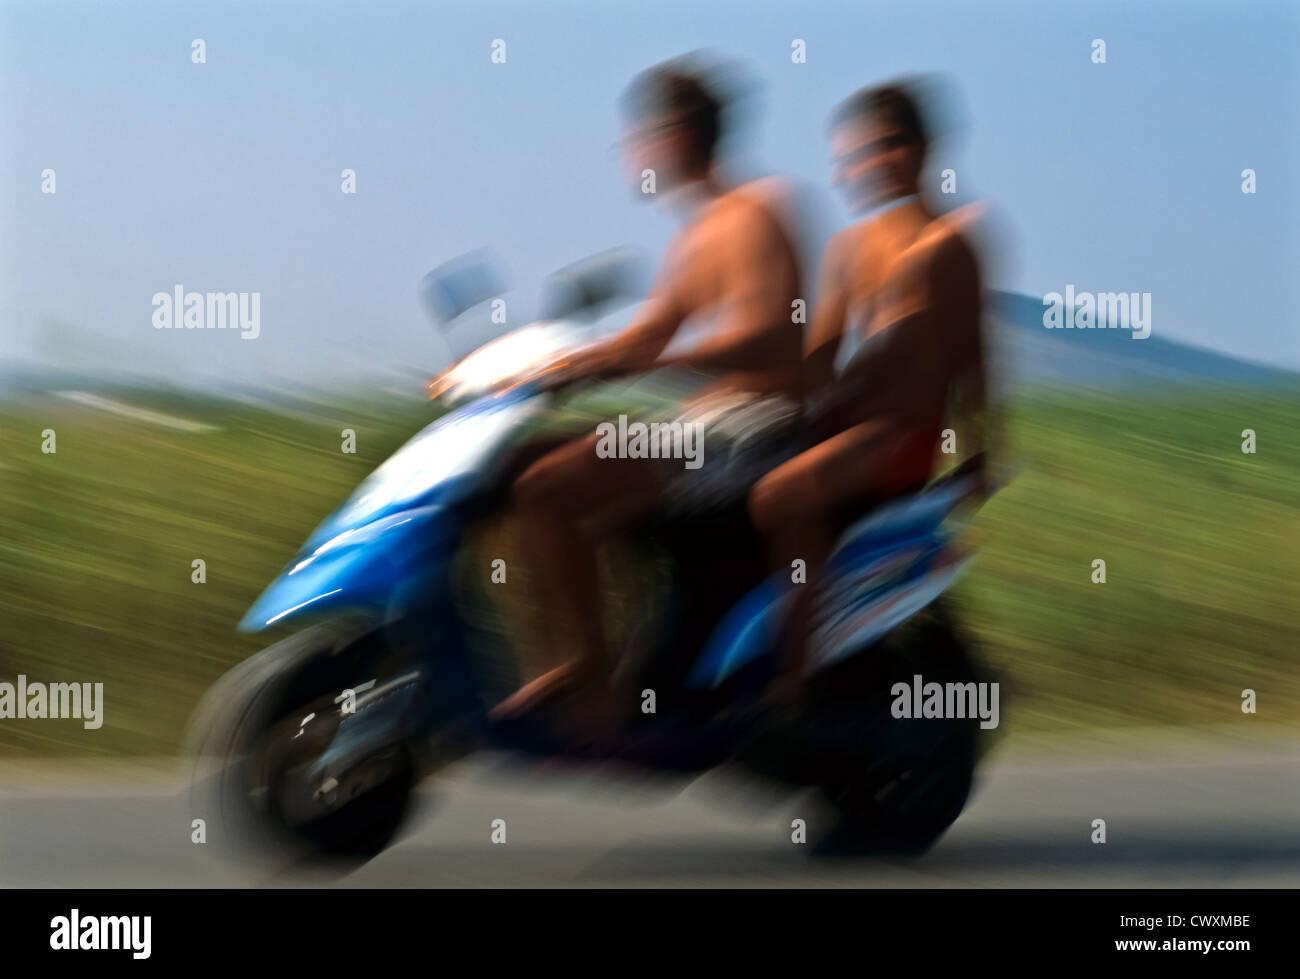 8095. Moped (soft focus), Mediterranean, Europe - Stock Image